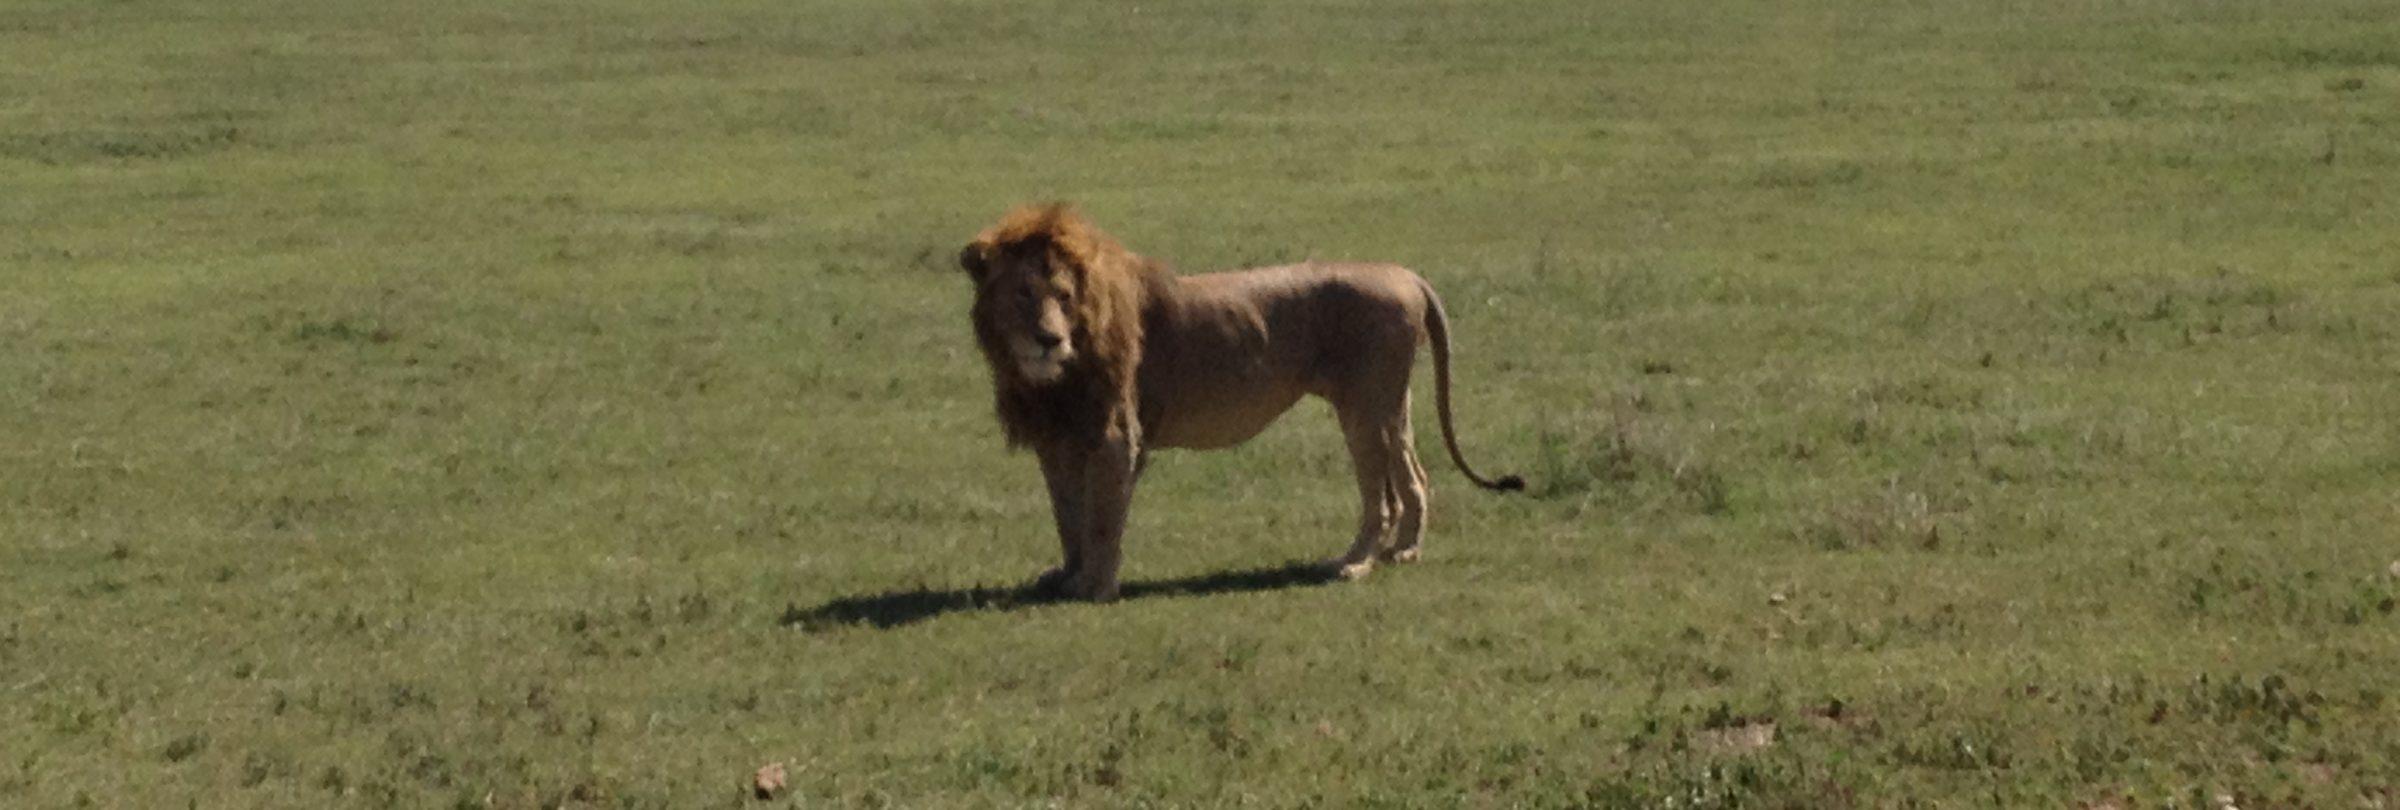 Ngorongoro Crater - Day 4 (46)